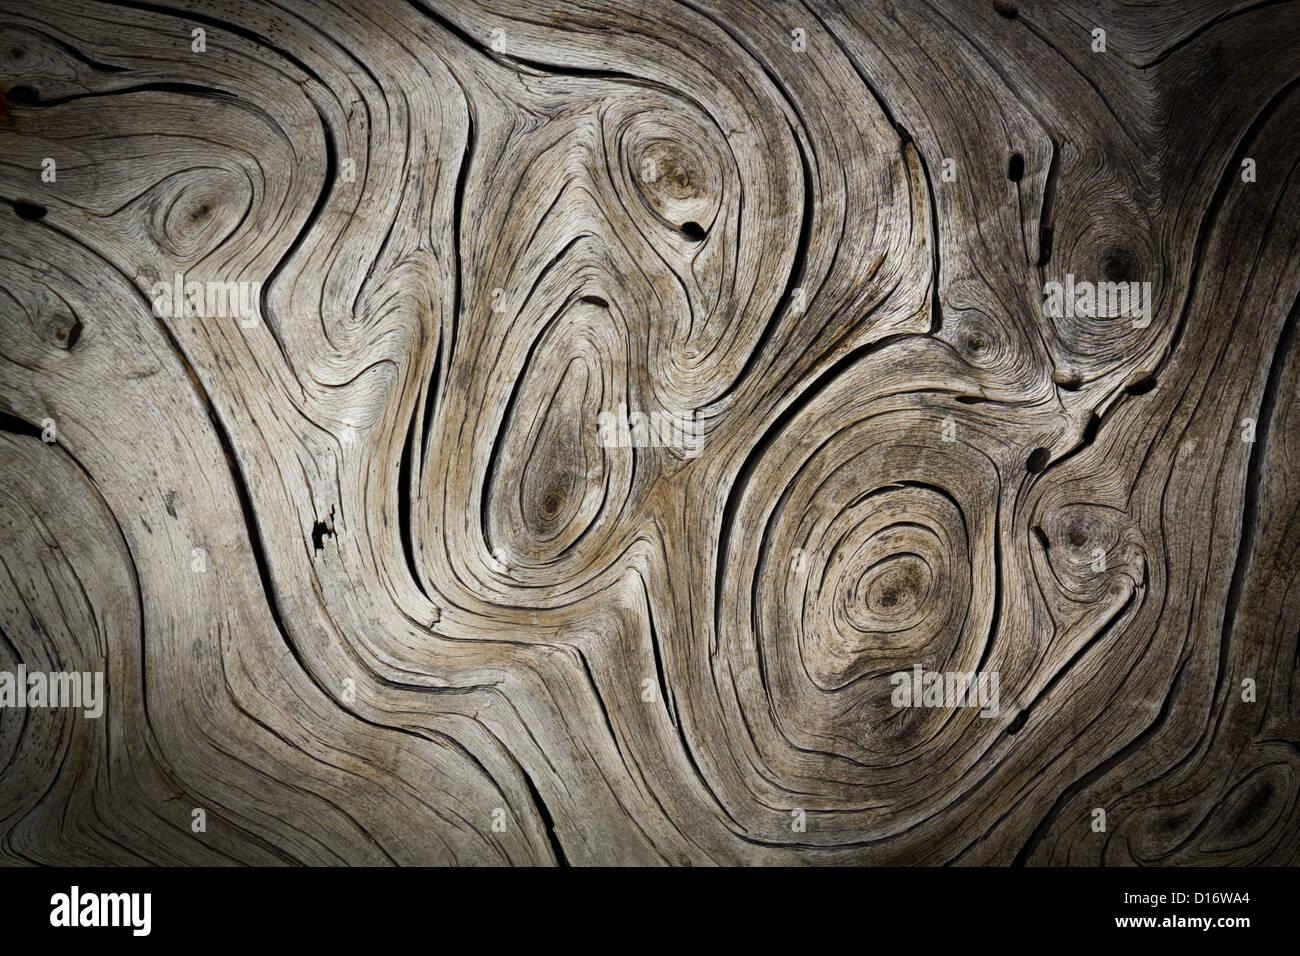 Wooden Swirls Dark Organic Background Texture - Stock Image